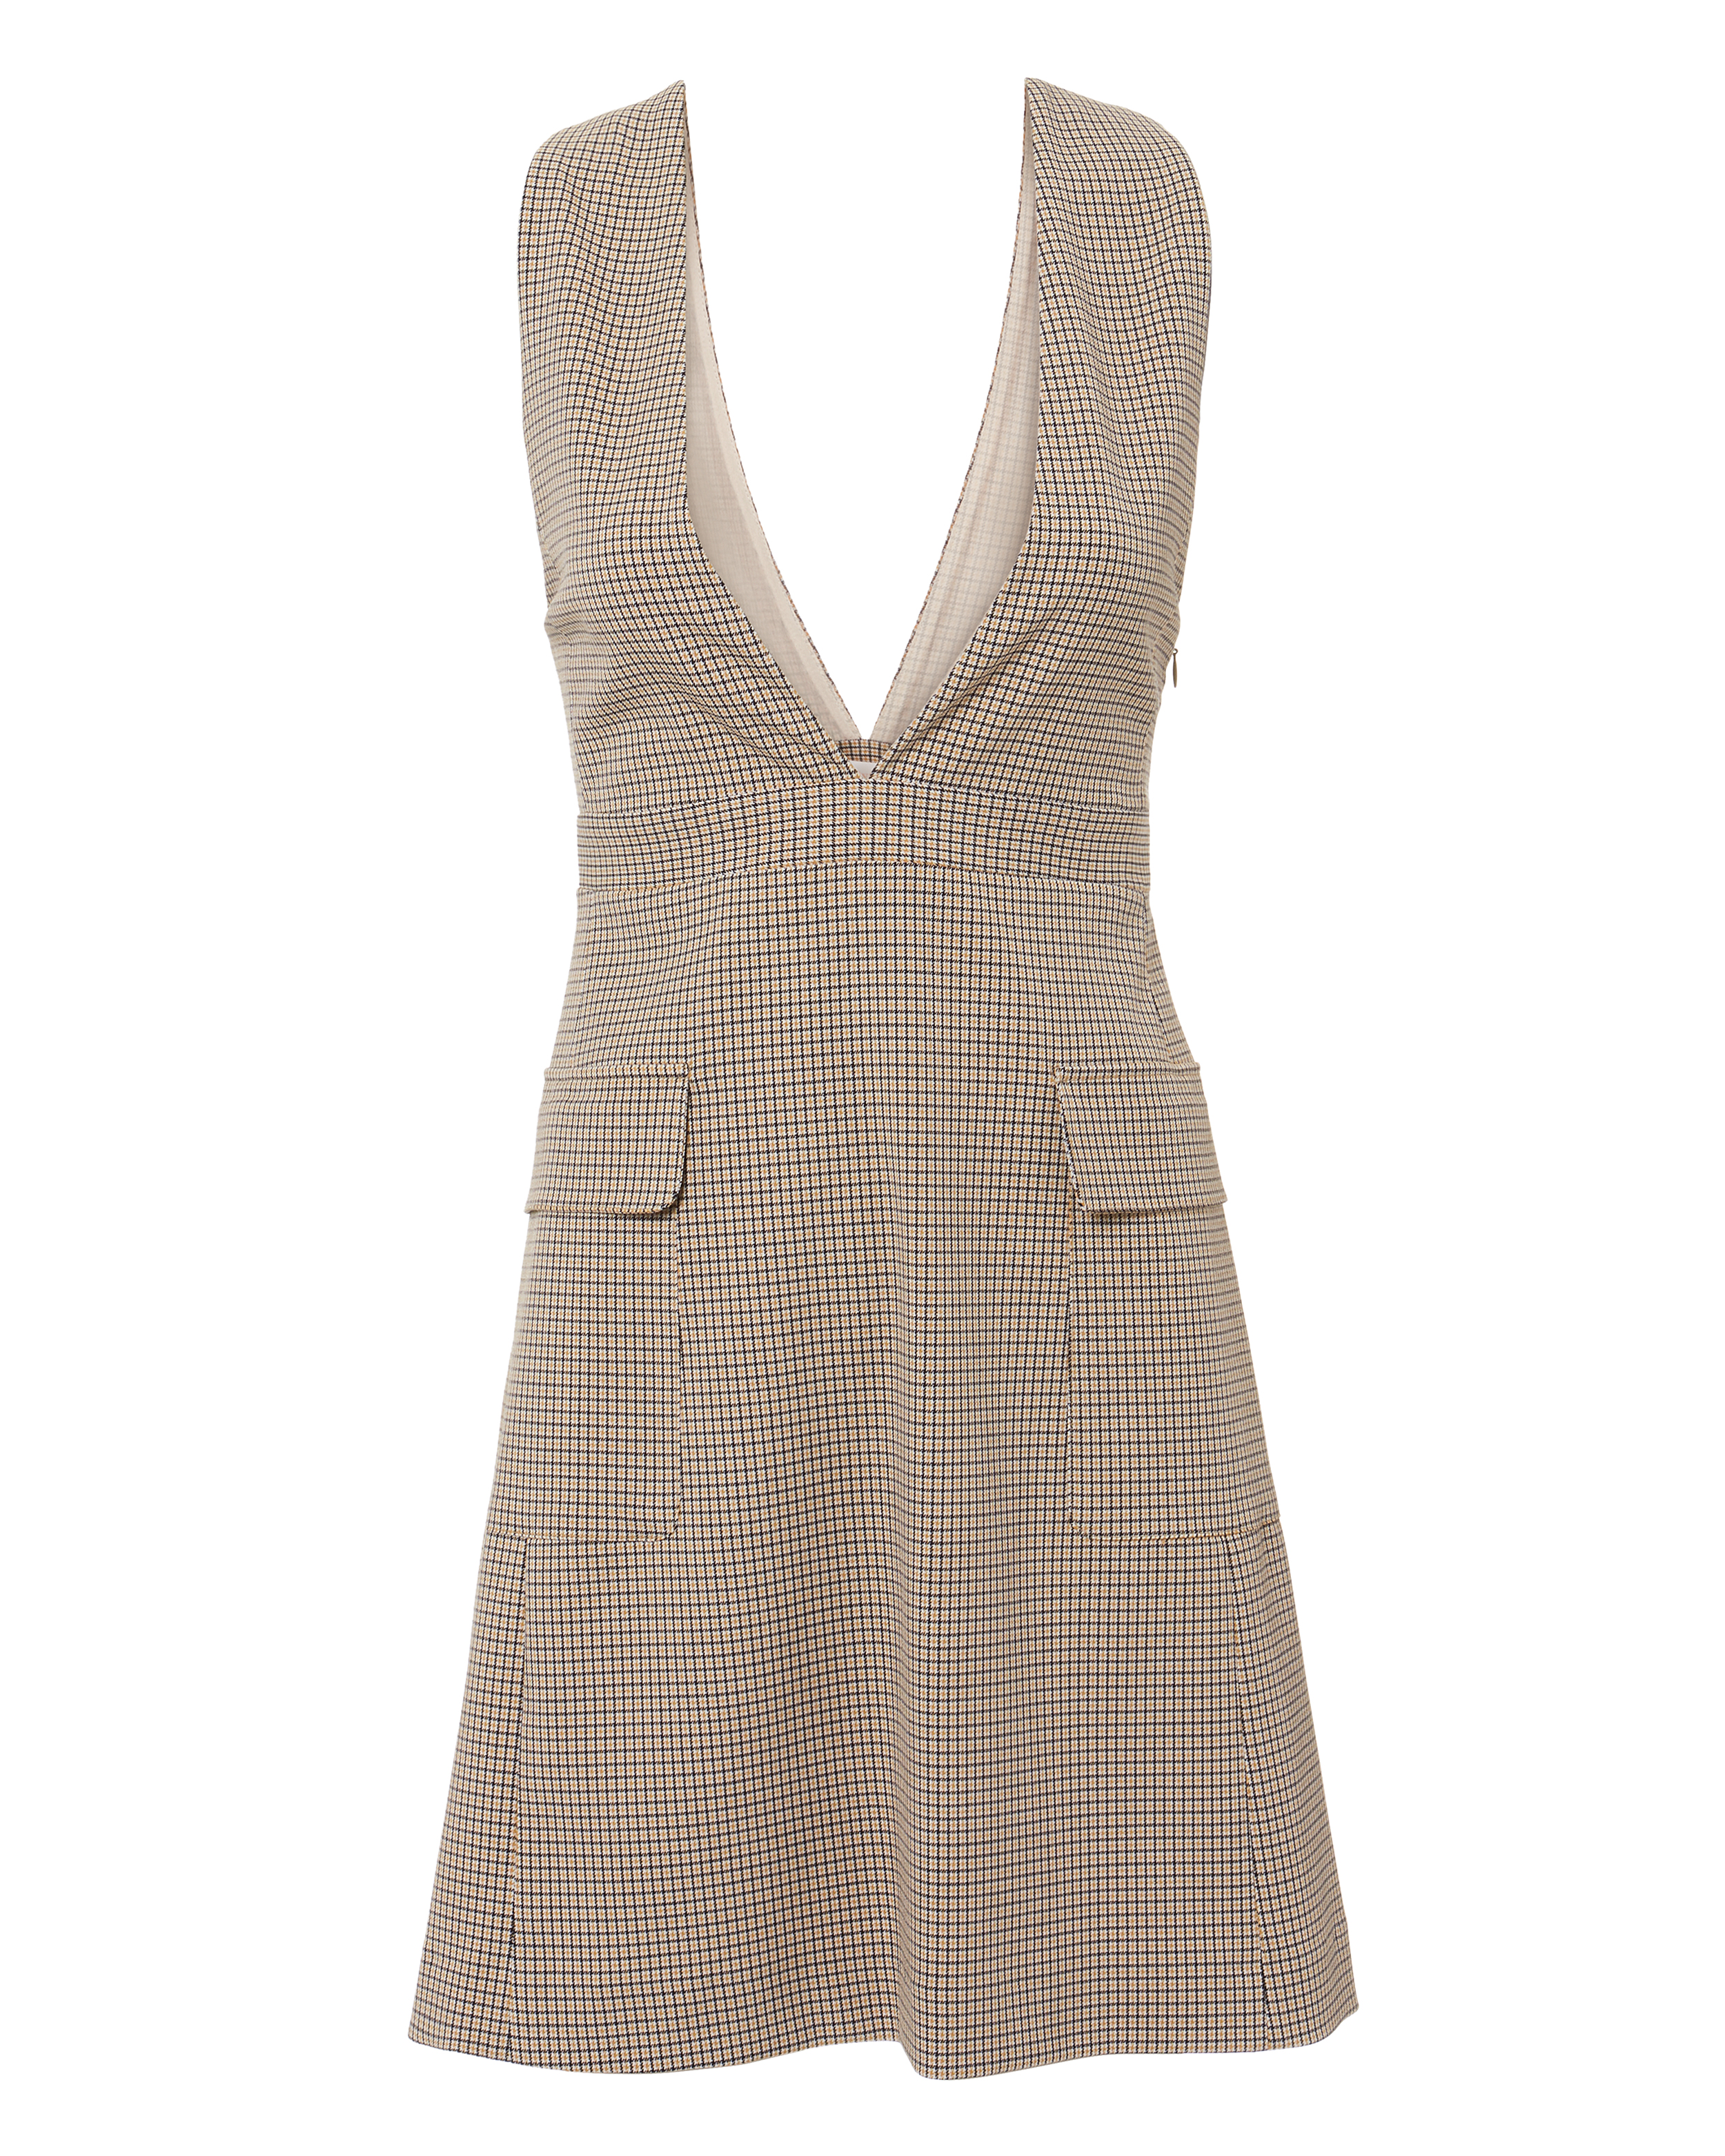 Plaid Mini Dress by See By Chloé